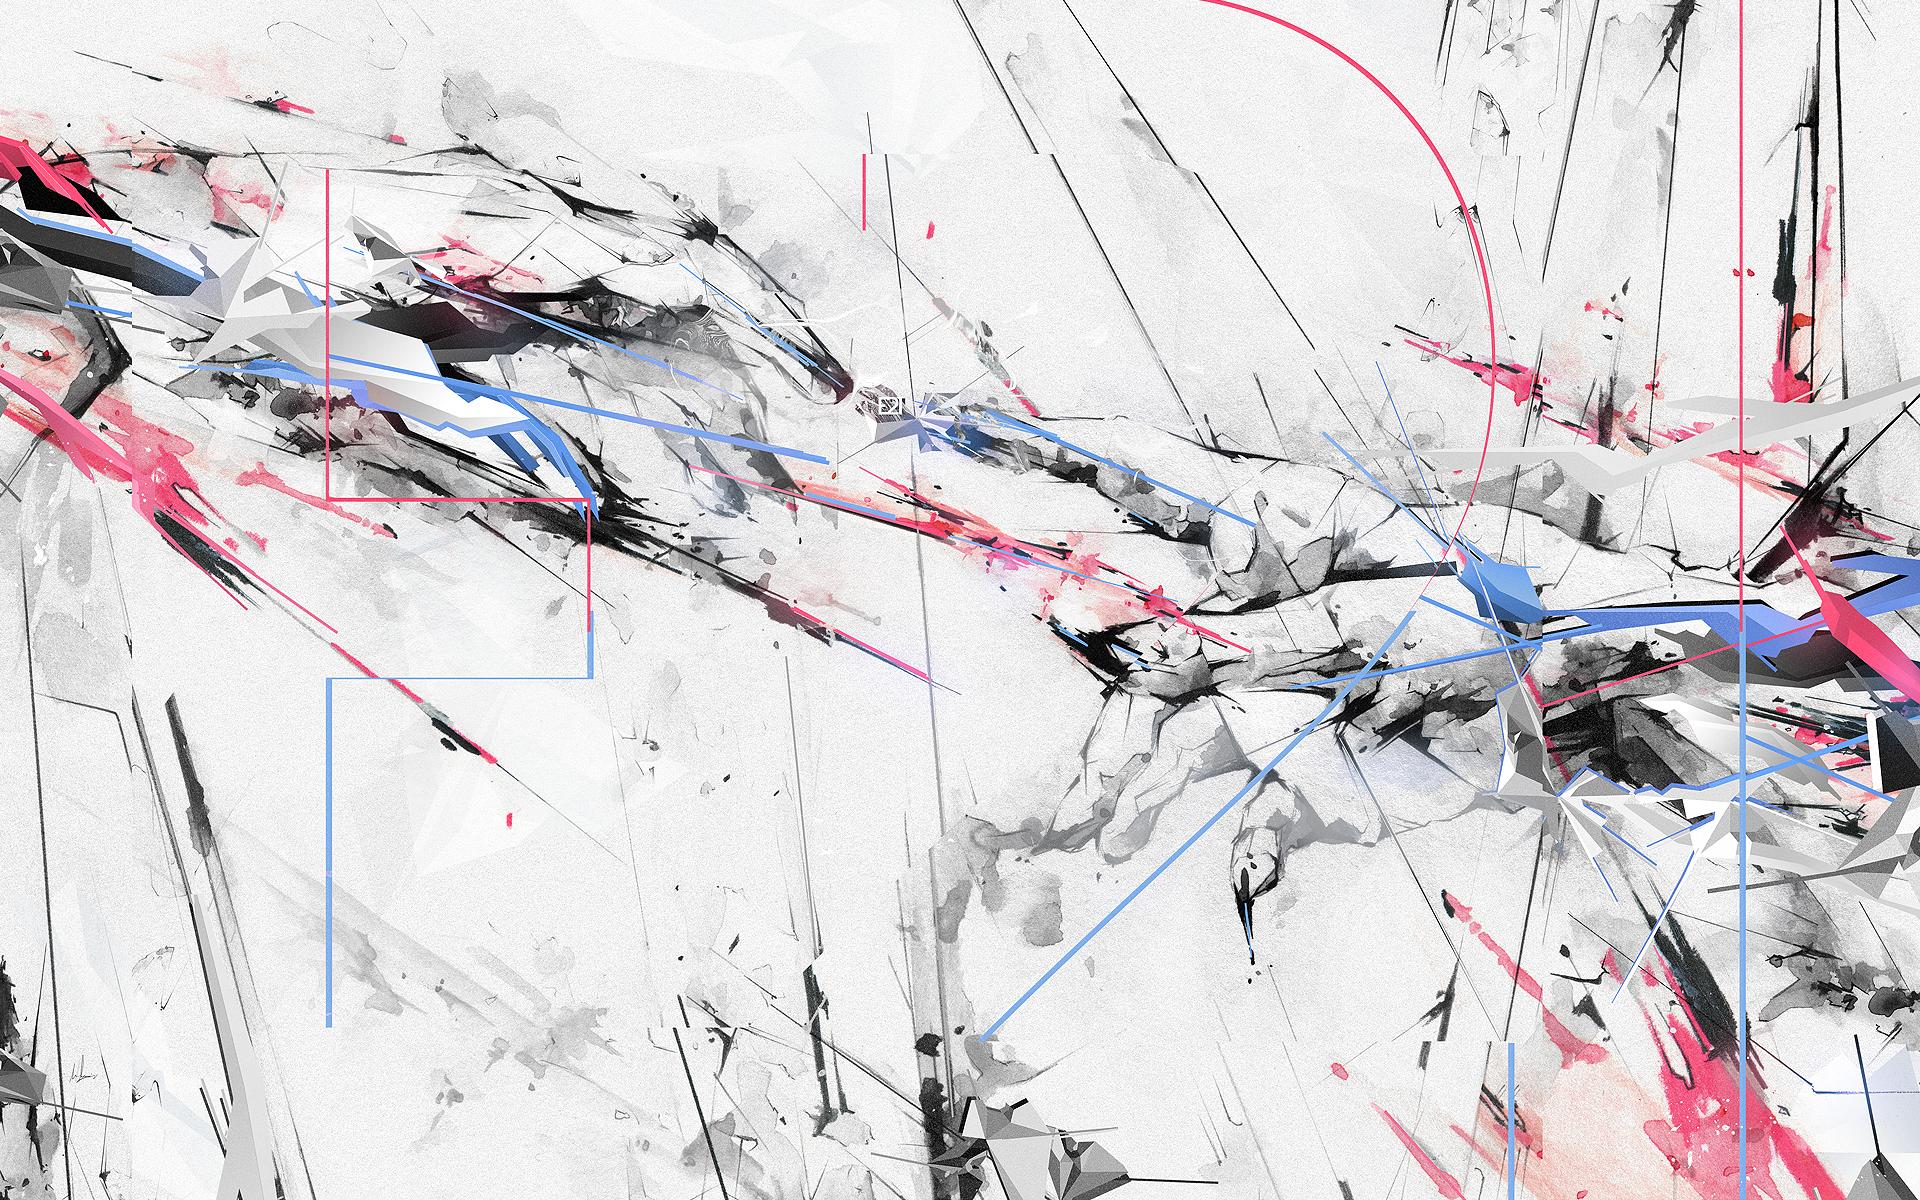 Abstract Artistic Digital Art 1920x1200